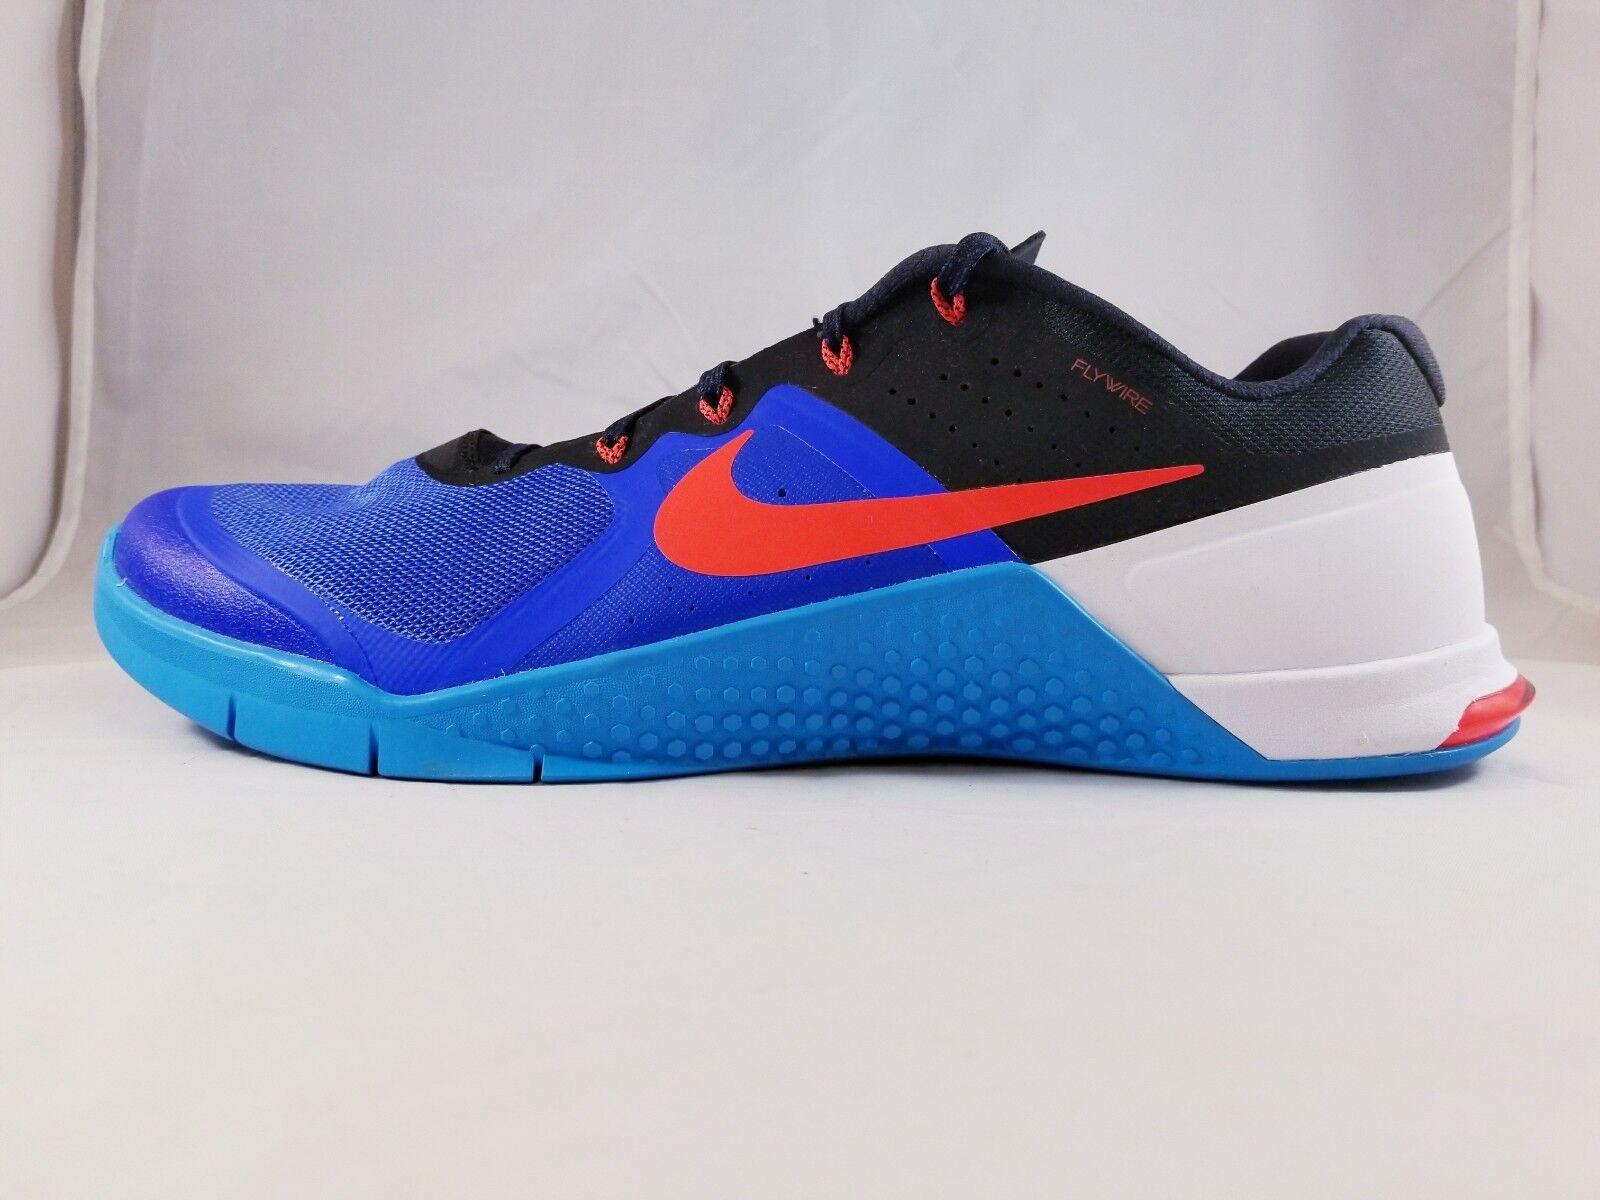 Nike metcon 2 uomini cross, scarpa 819899 464 numero 13